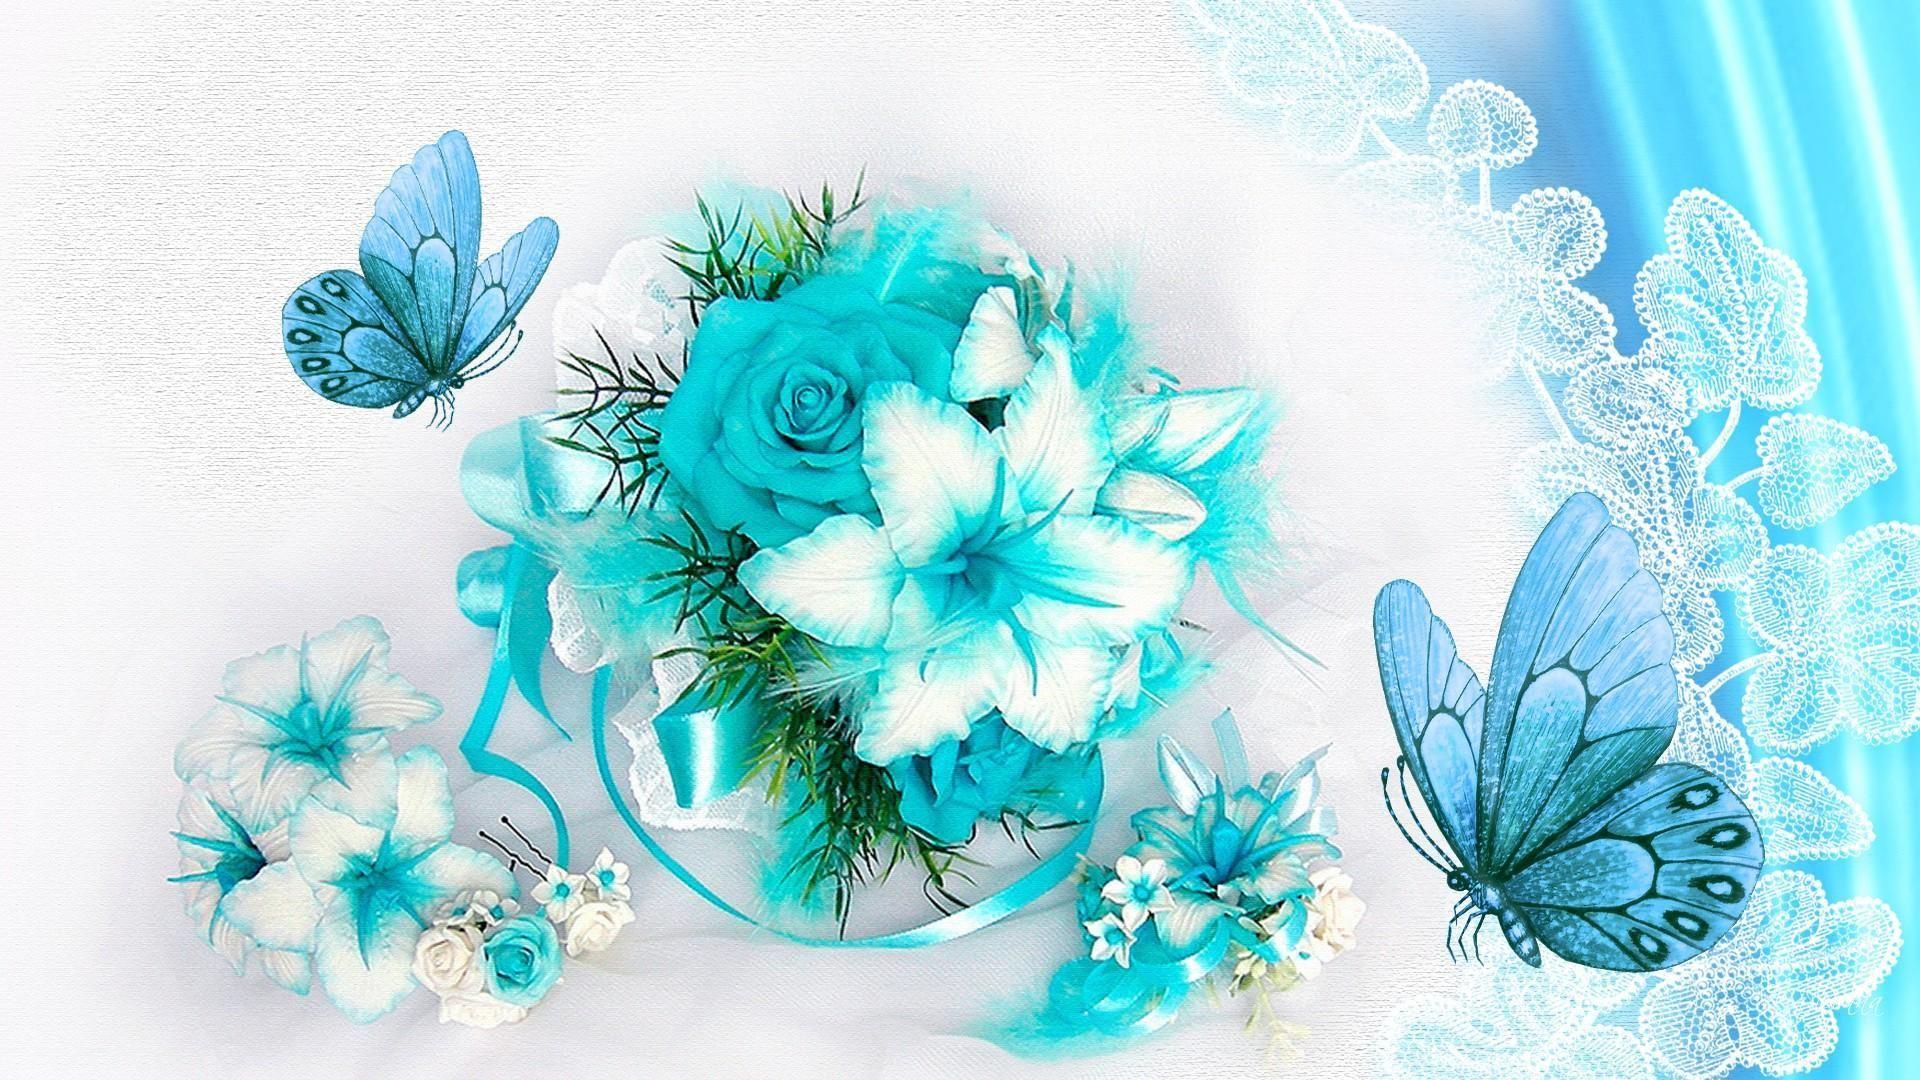 Butterfly Wallpaper Turquoise Aquamarine Floral Hd Desktop Wallpaper Oboi Oboi Dlya Rabochego Stola Kartinki